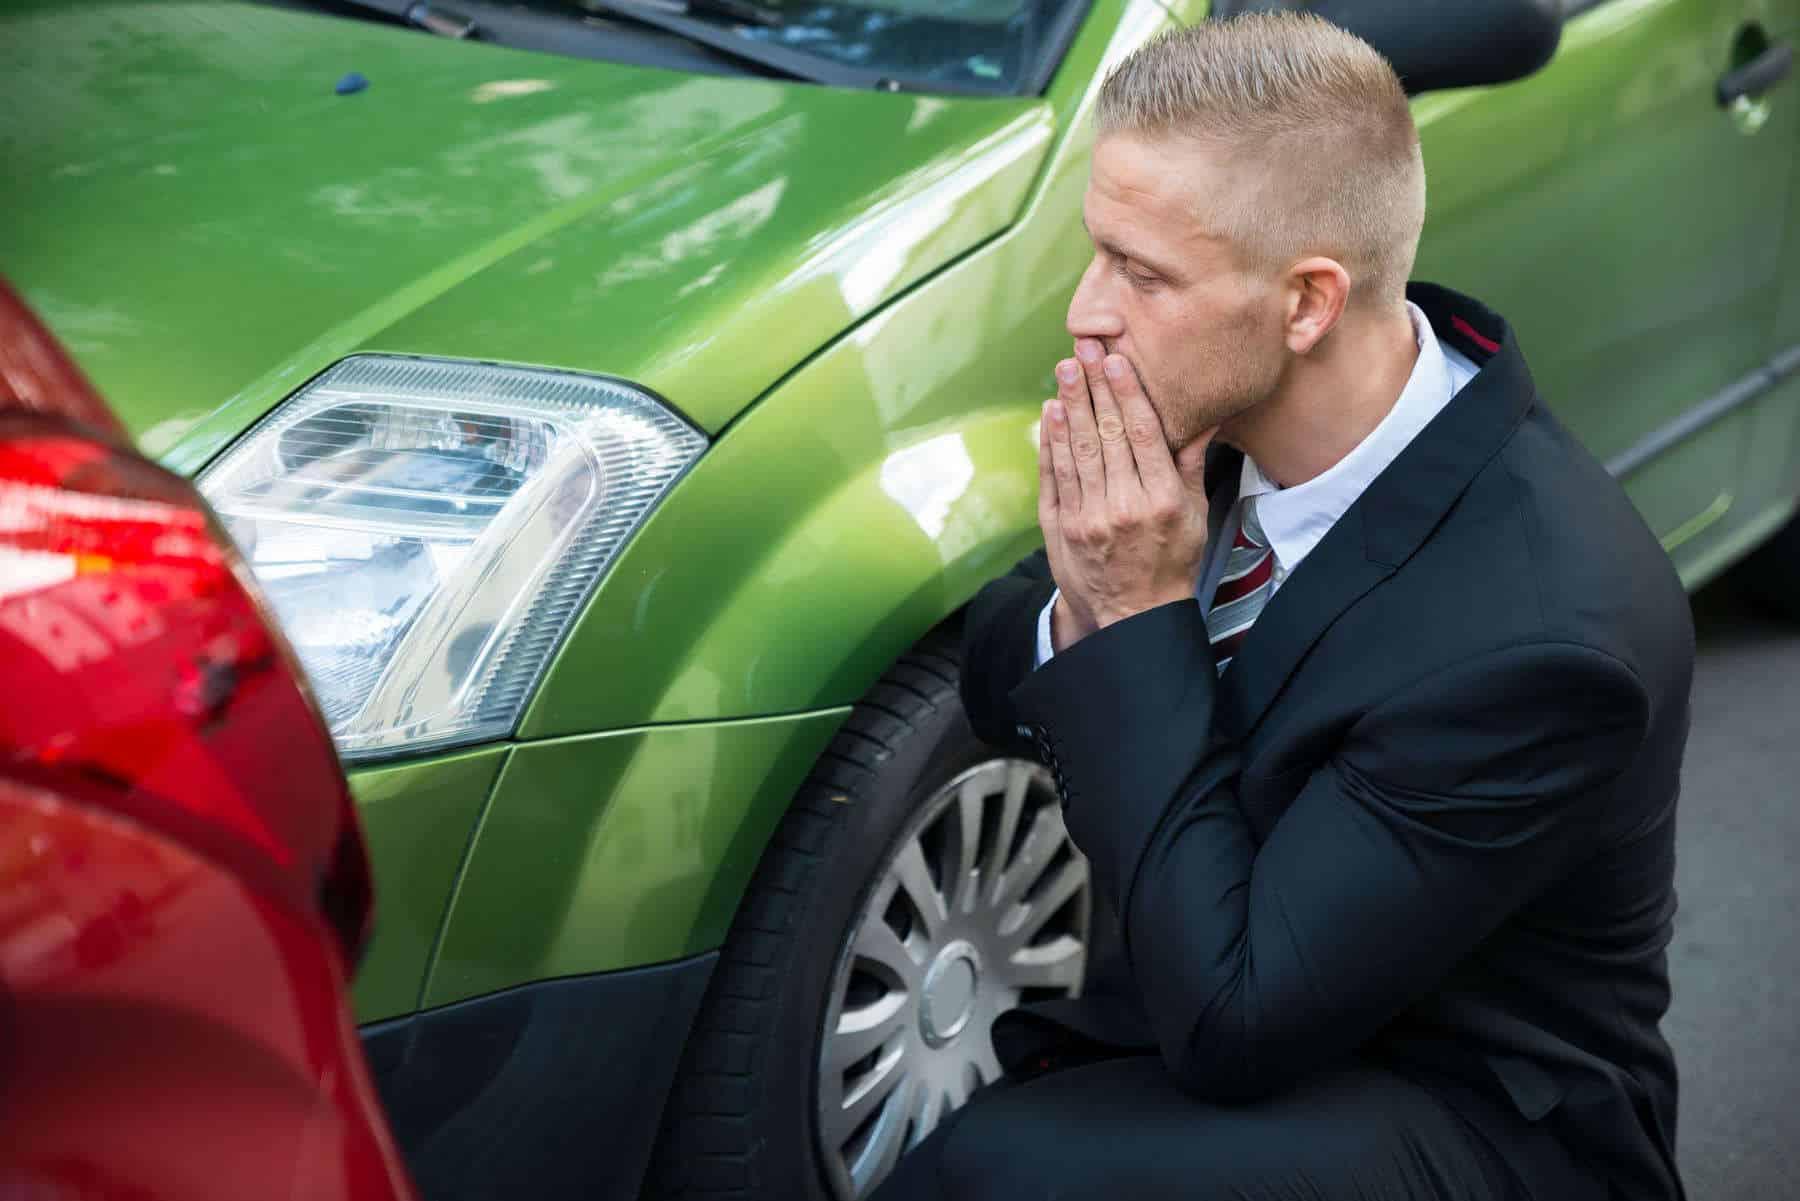 5 automobile claims